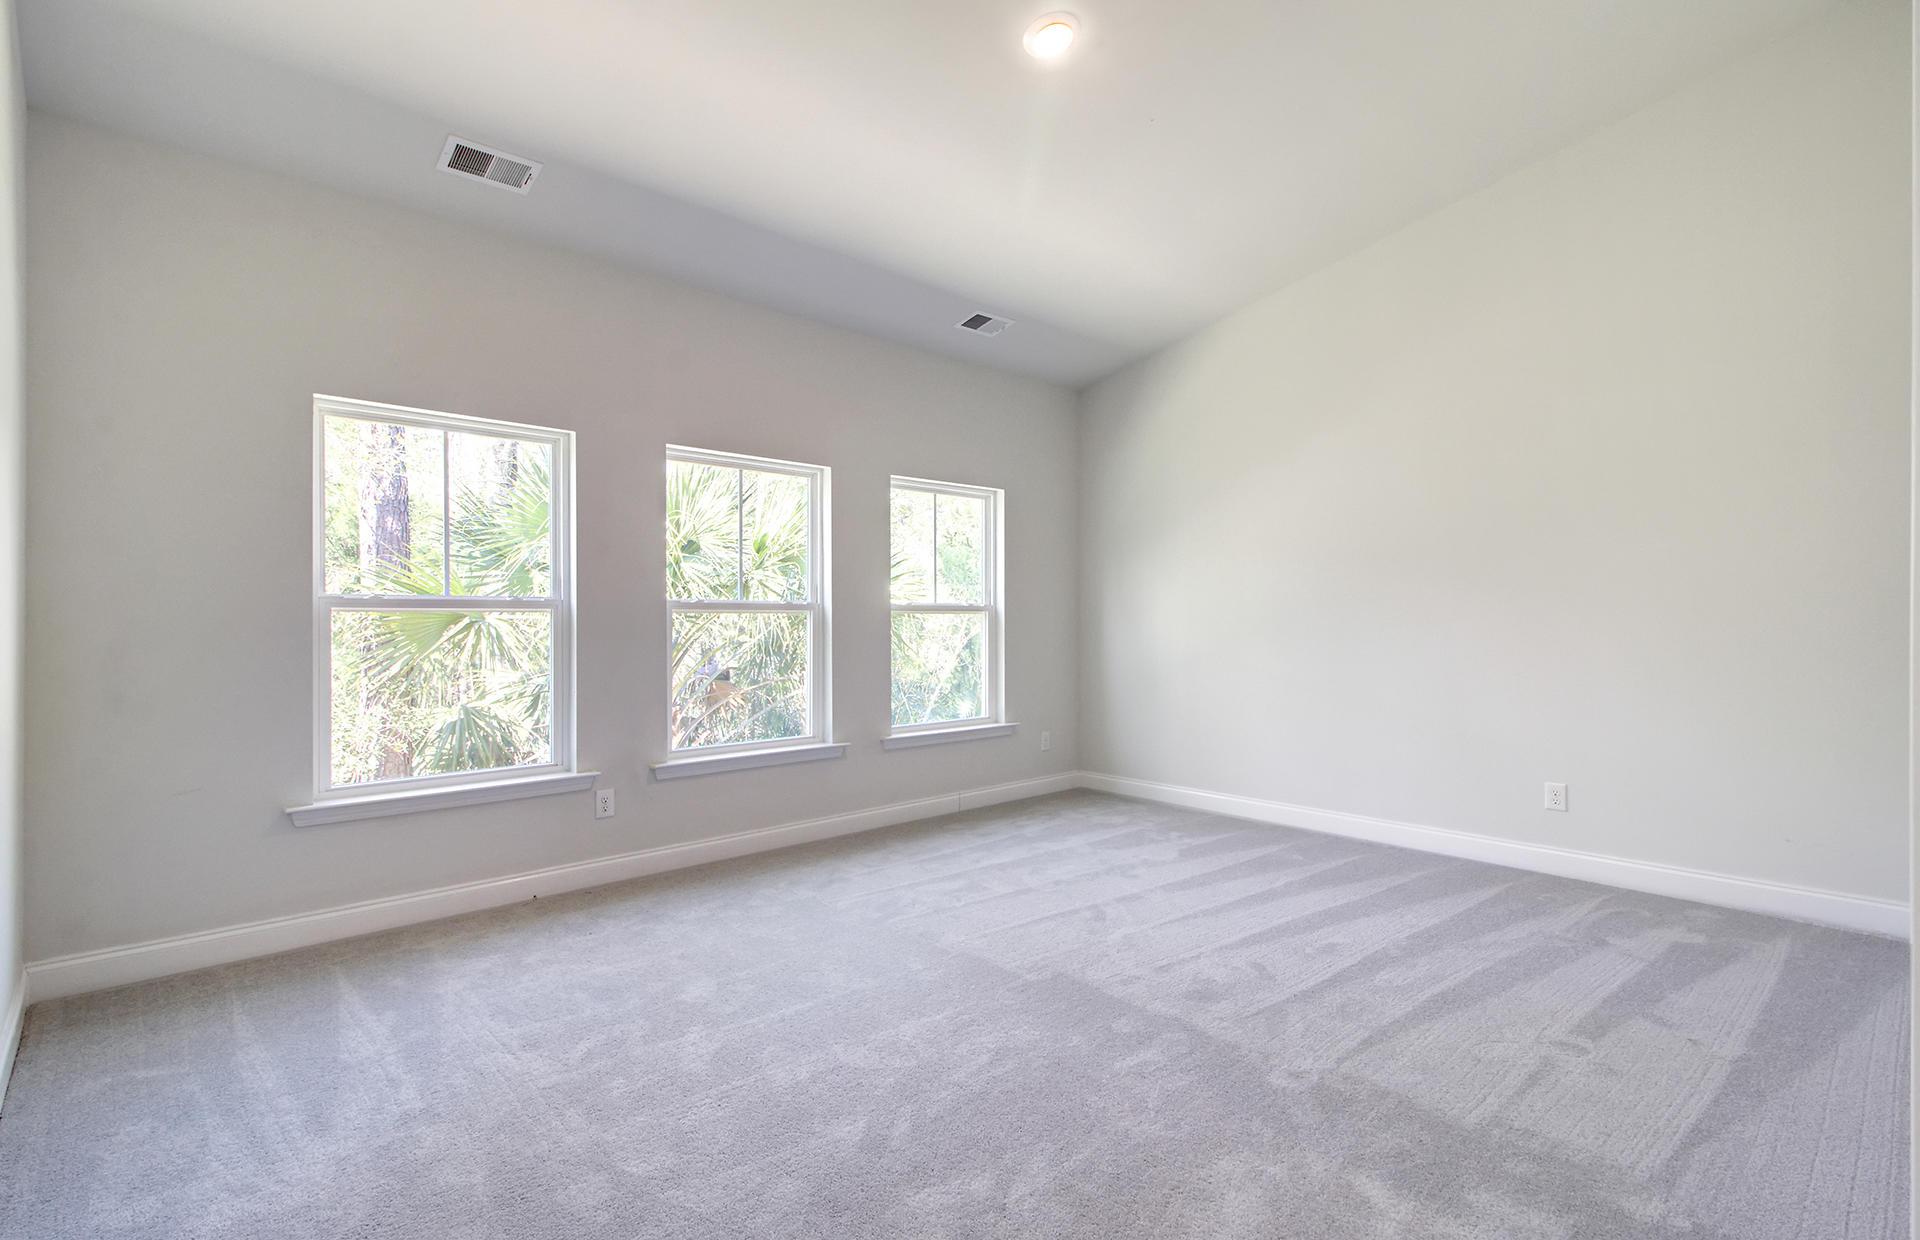 Park West Homes For Sale - 3066 Rice Field, Mount Pleasant, SC - 53